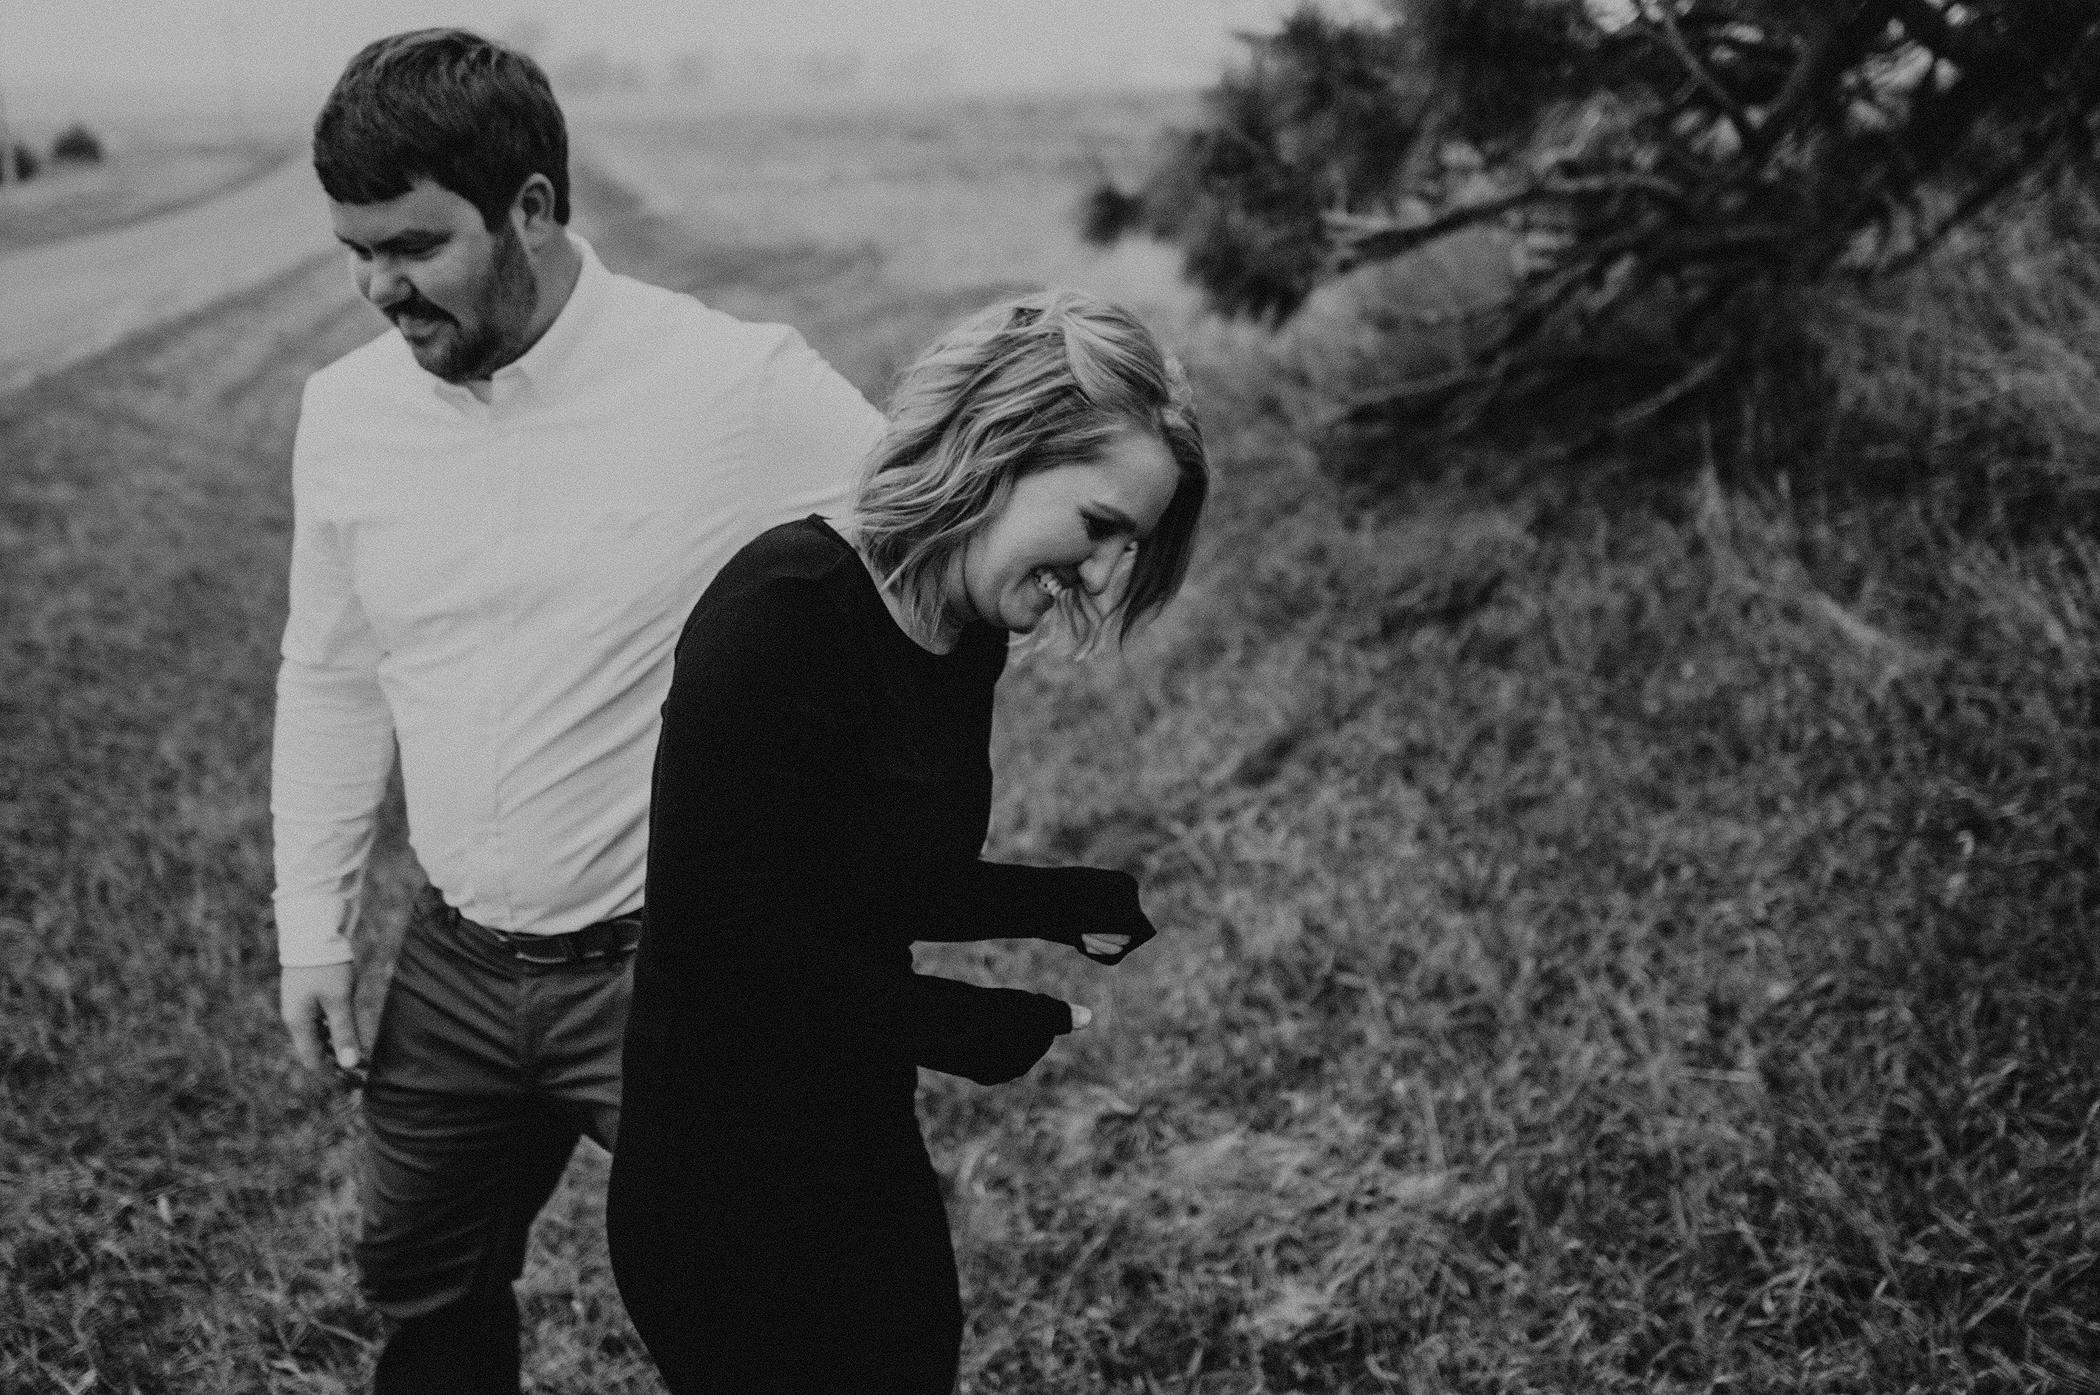 kaylie-sirek-nebraska-wedding-engagement-photographer-photography-grand-island-kearney-hastings-lincoln-37.png